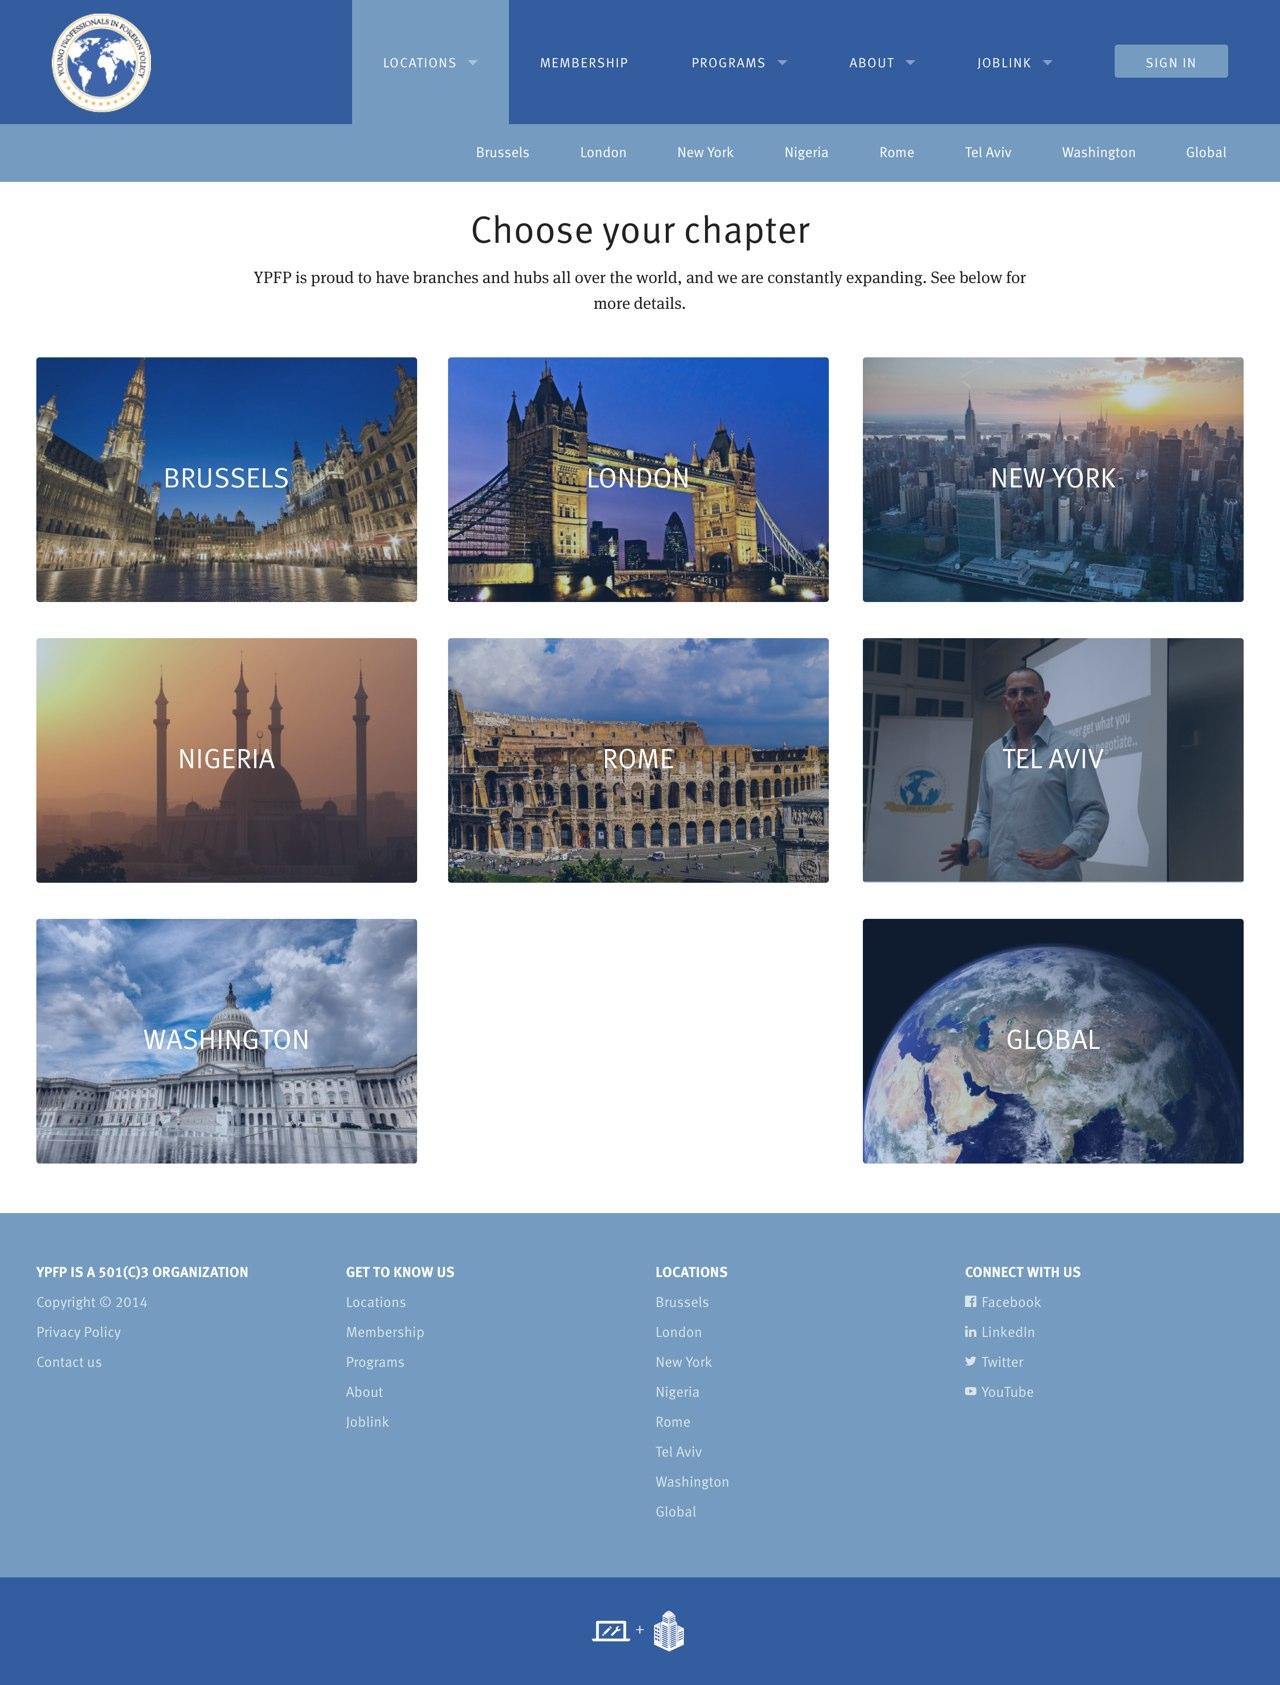 Screenshot: Choose your chapter